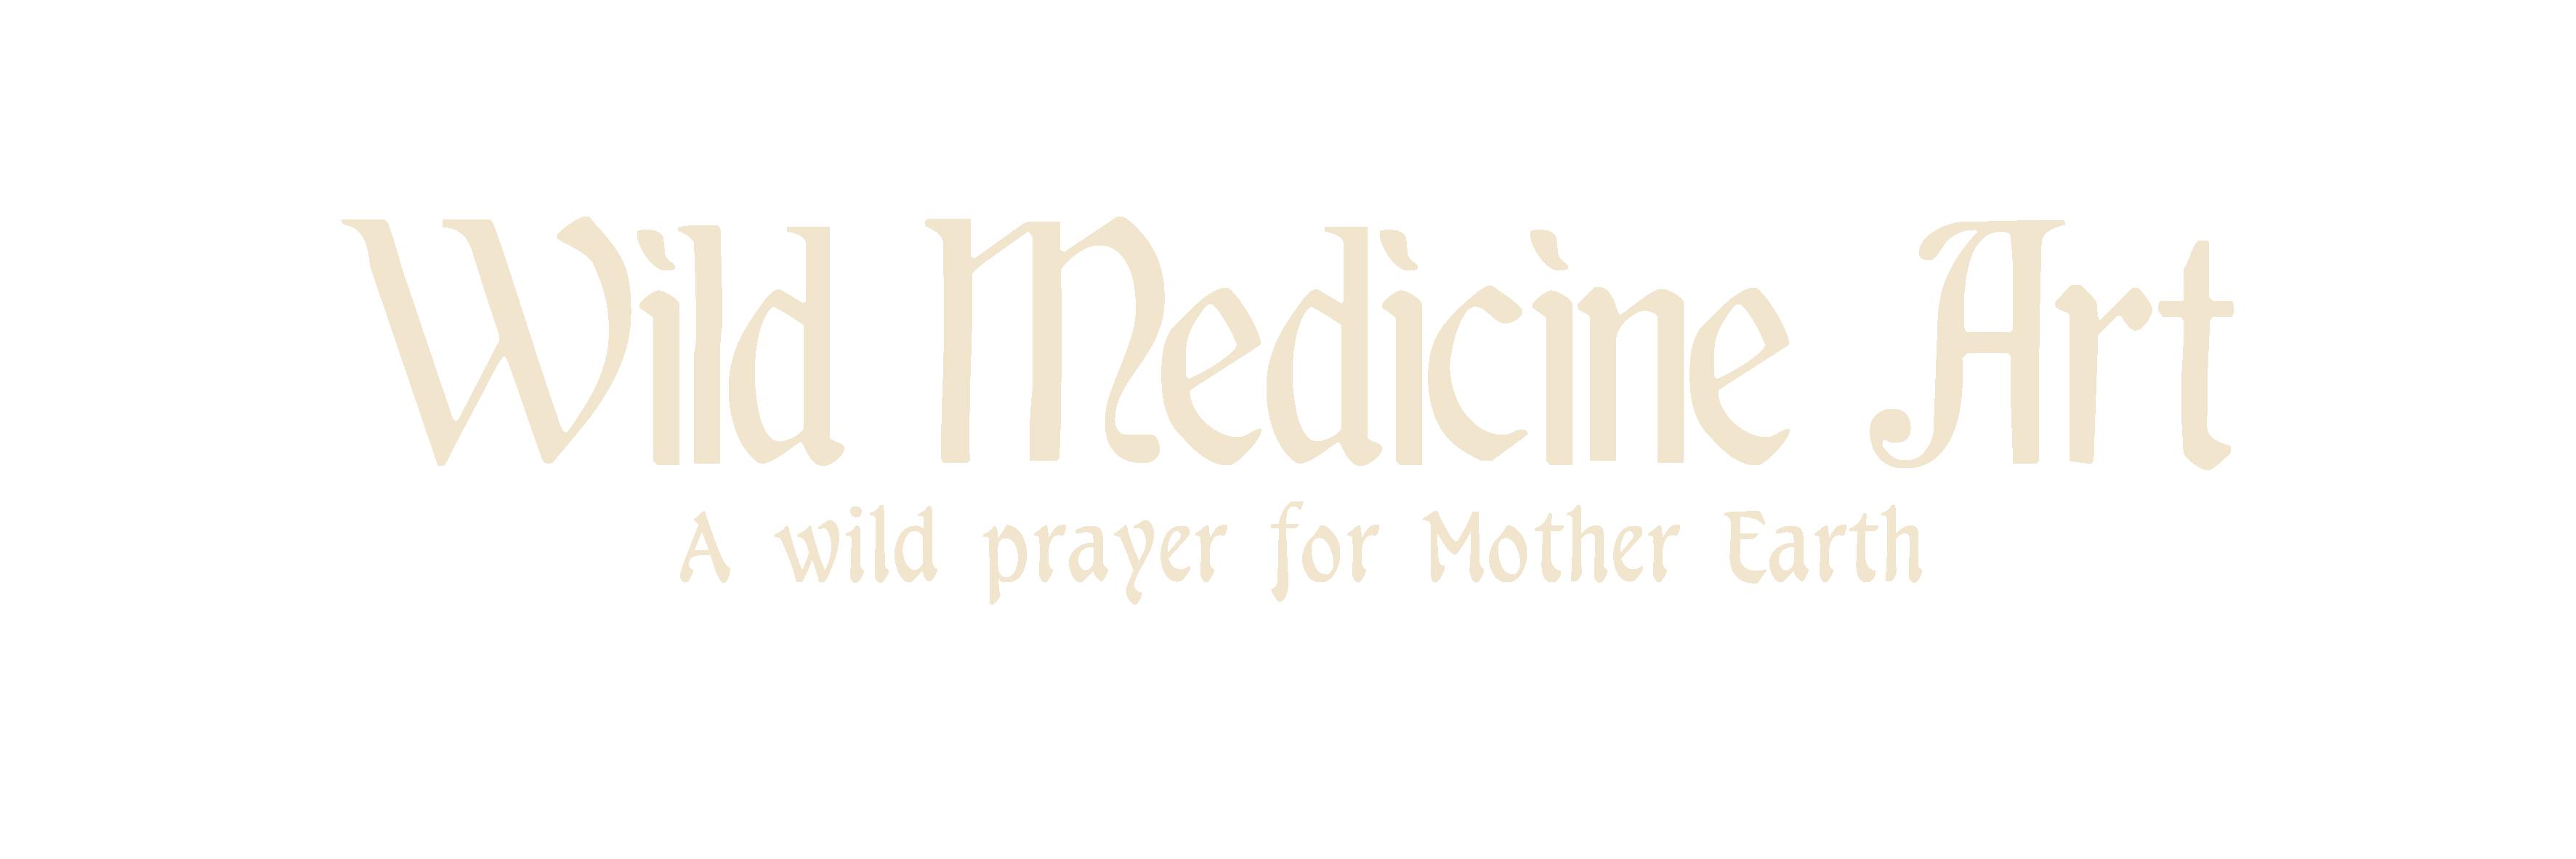 WMA_Website_Heading_Wild Medicine Art copy